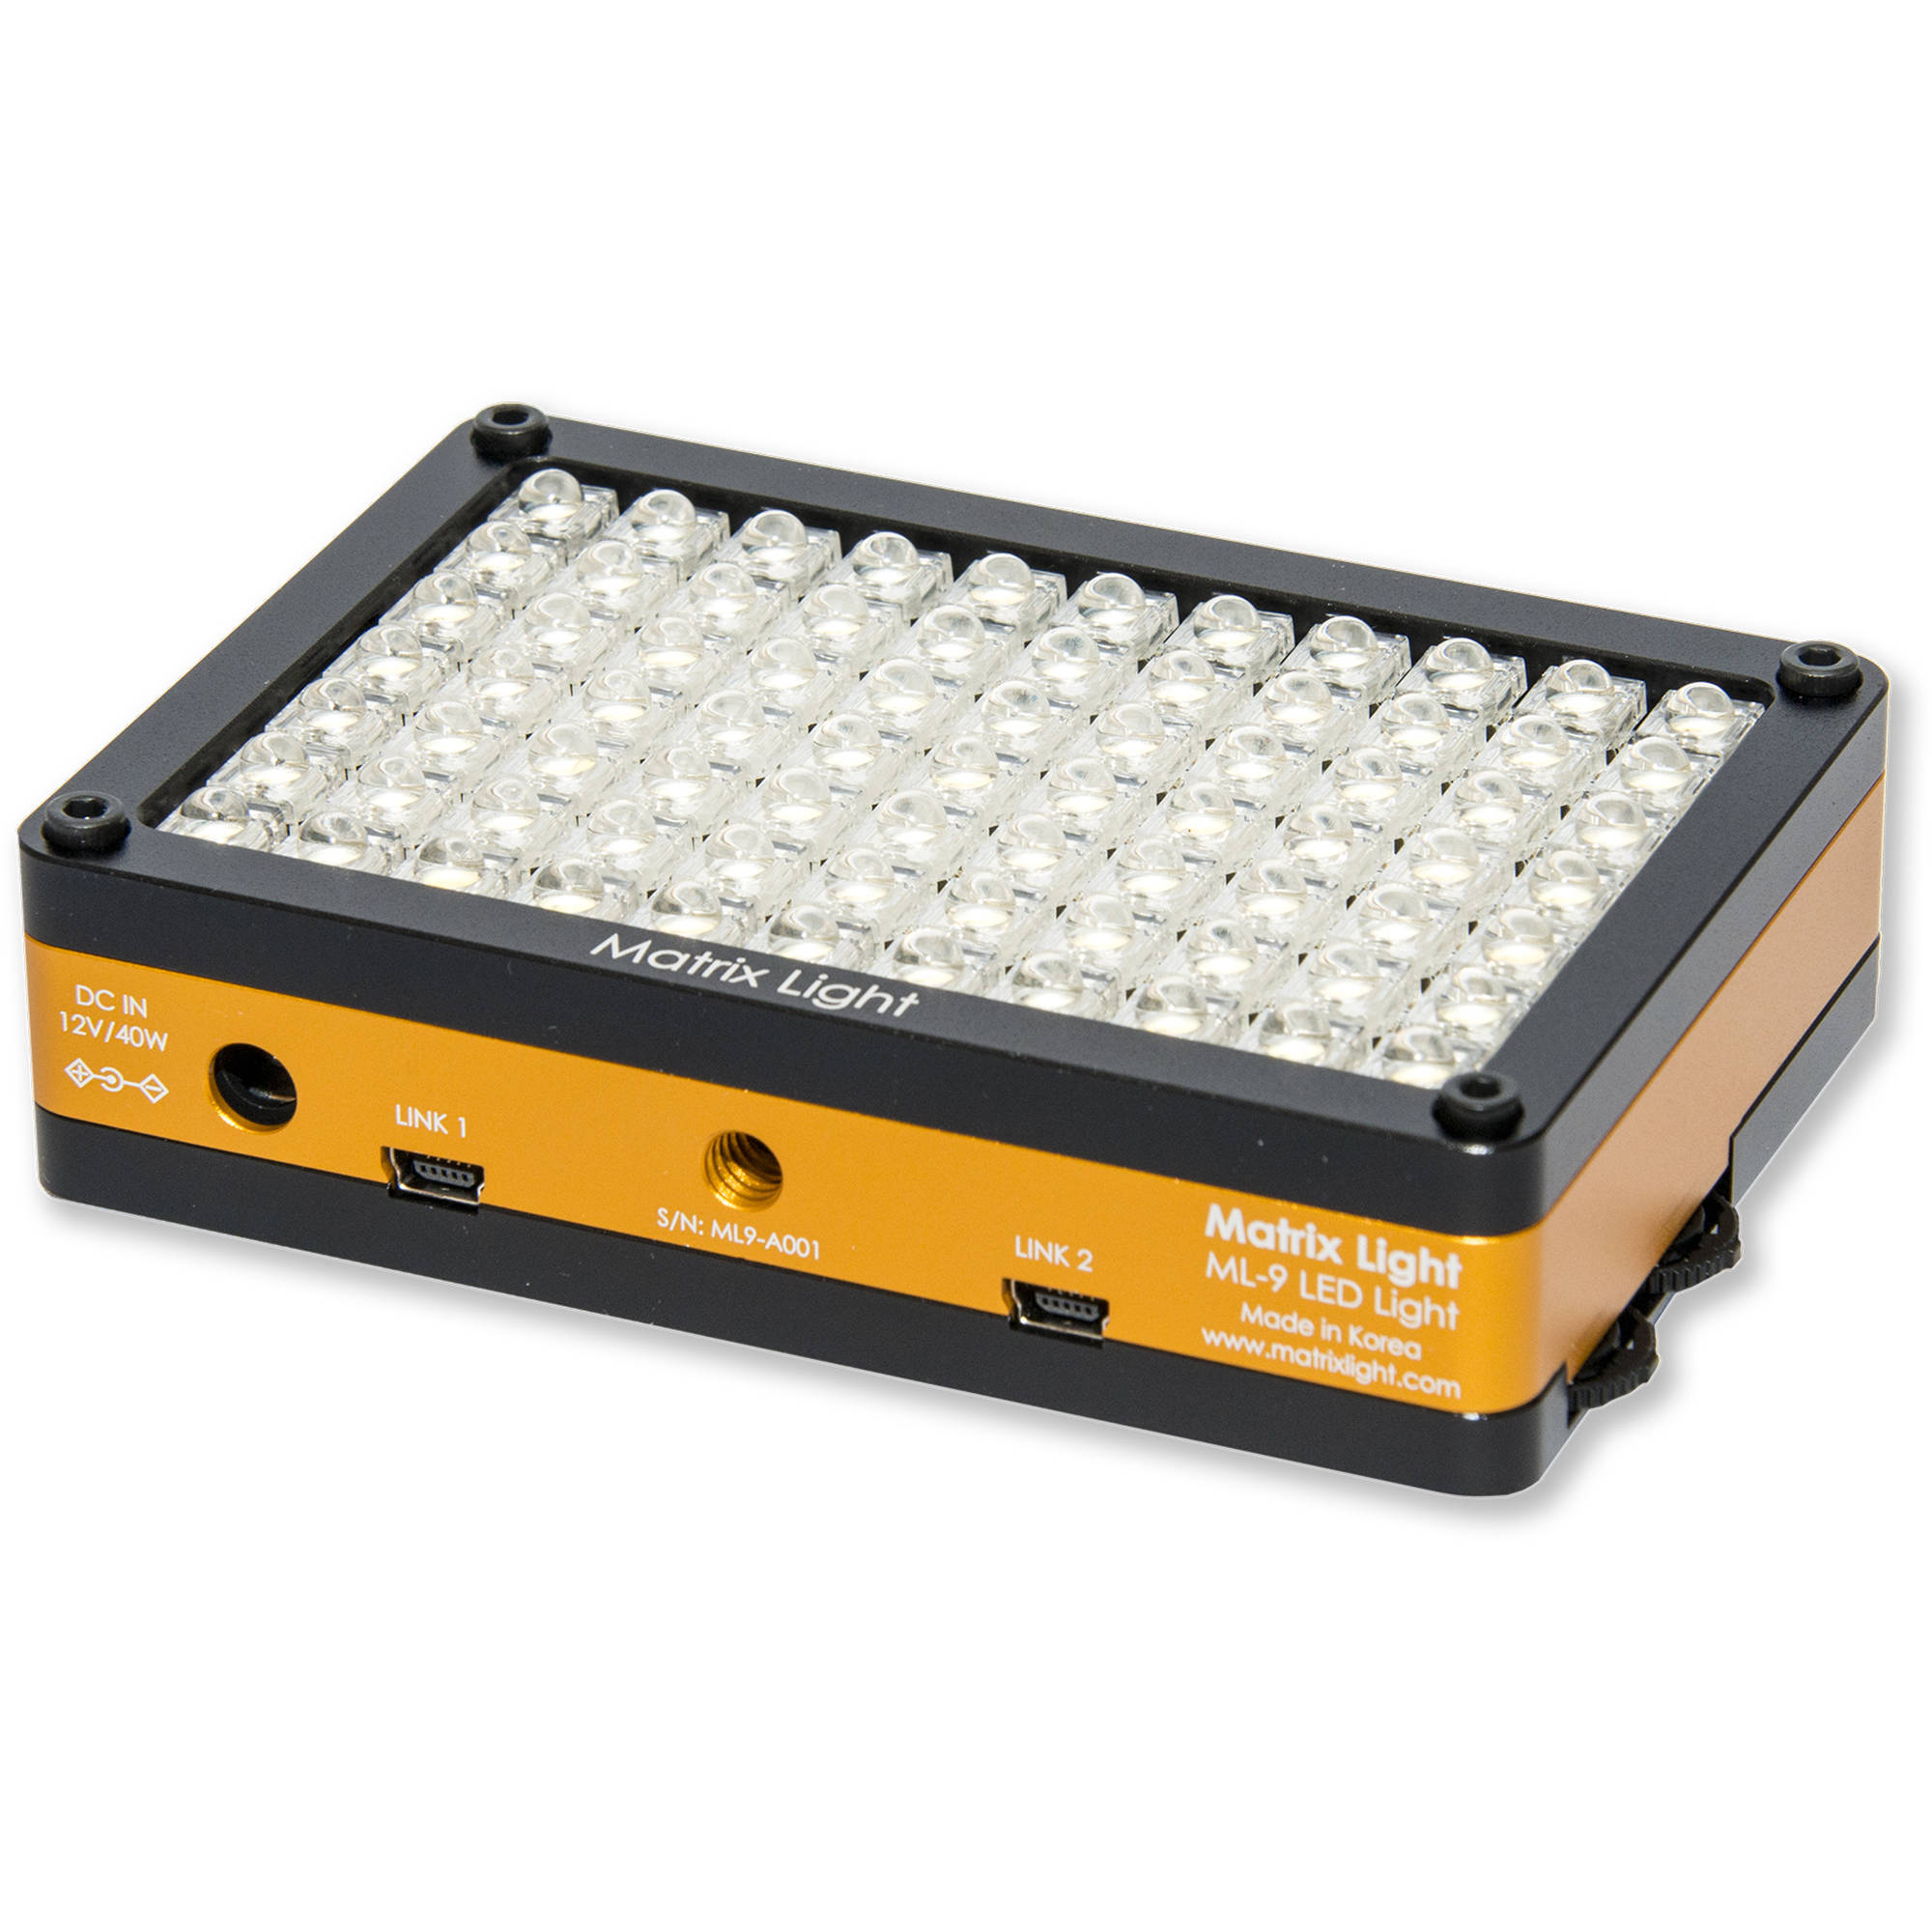 Matrix light ml 9 led light module ml 9 bh photo video matrix light ml 9 led light module freerunsca Choice Image